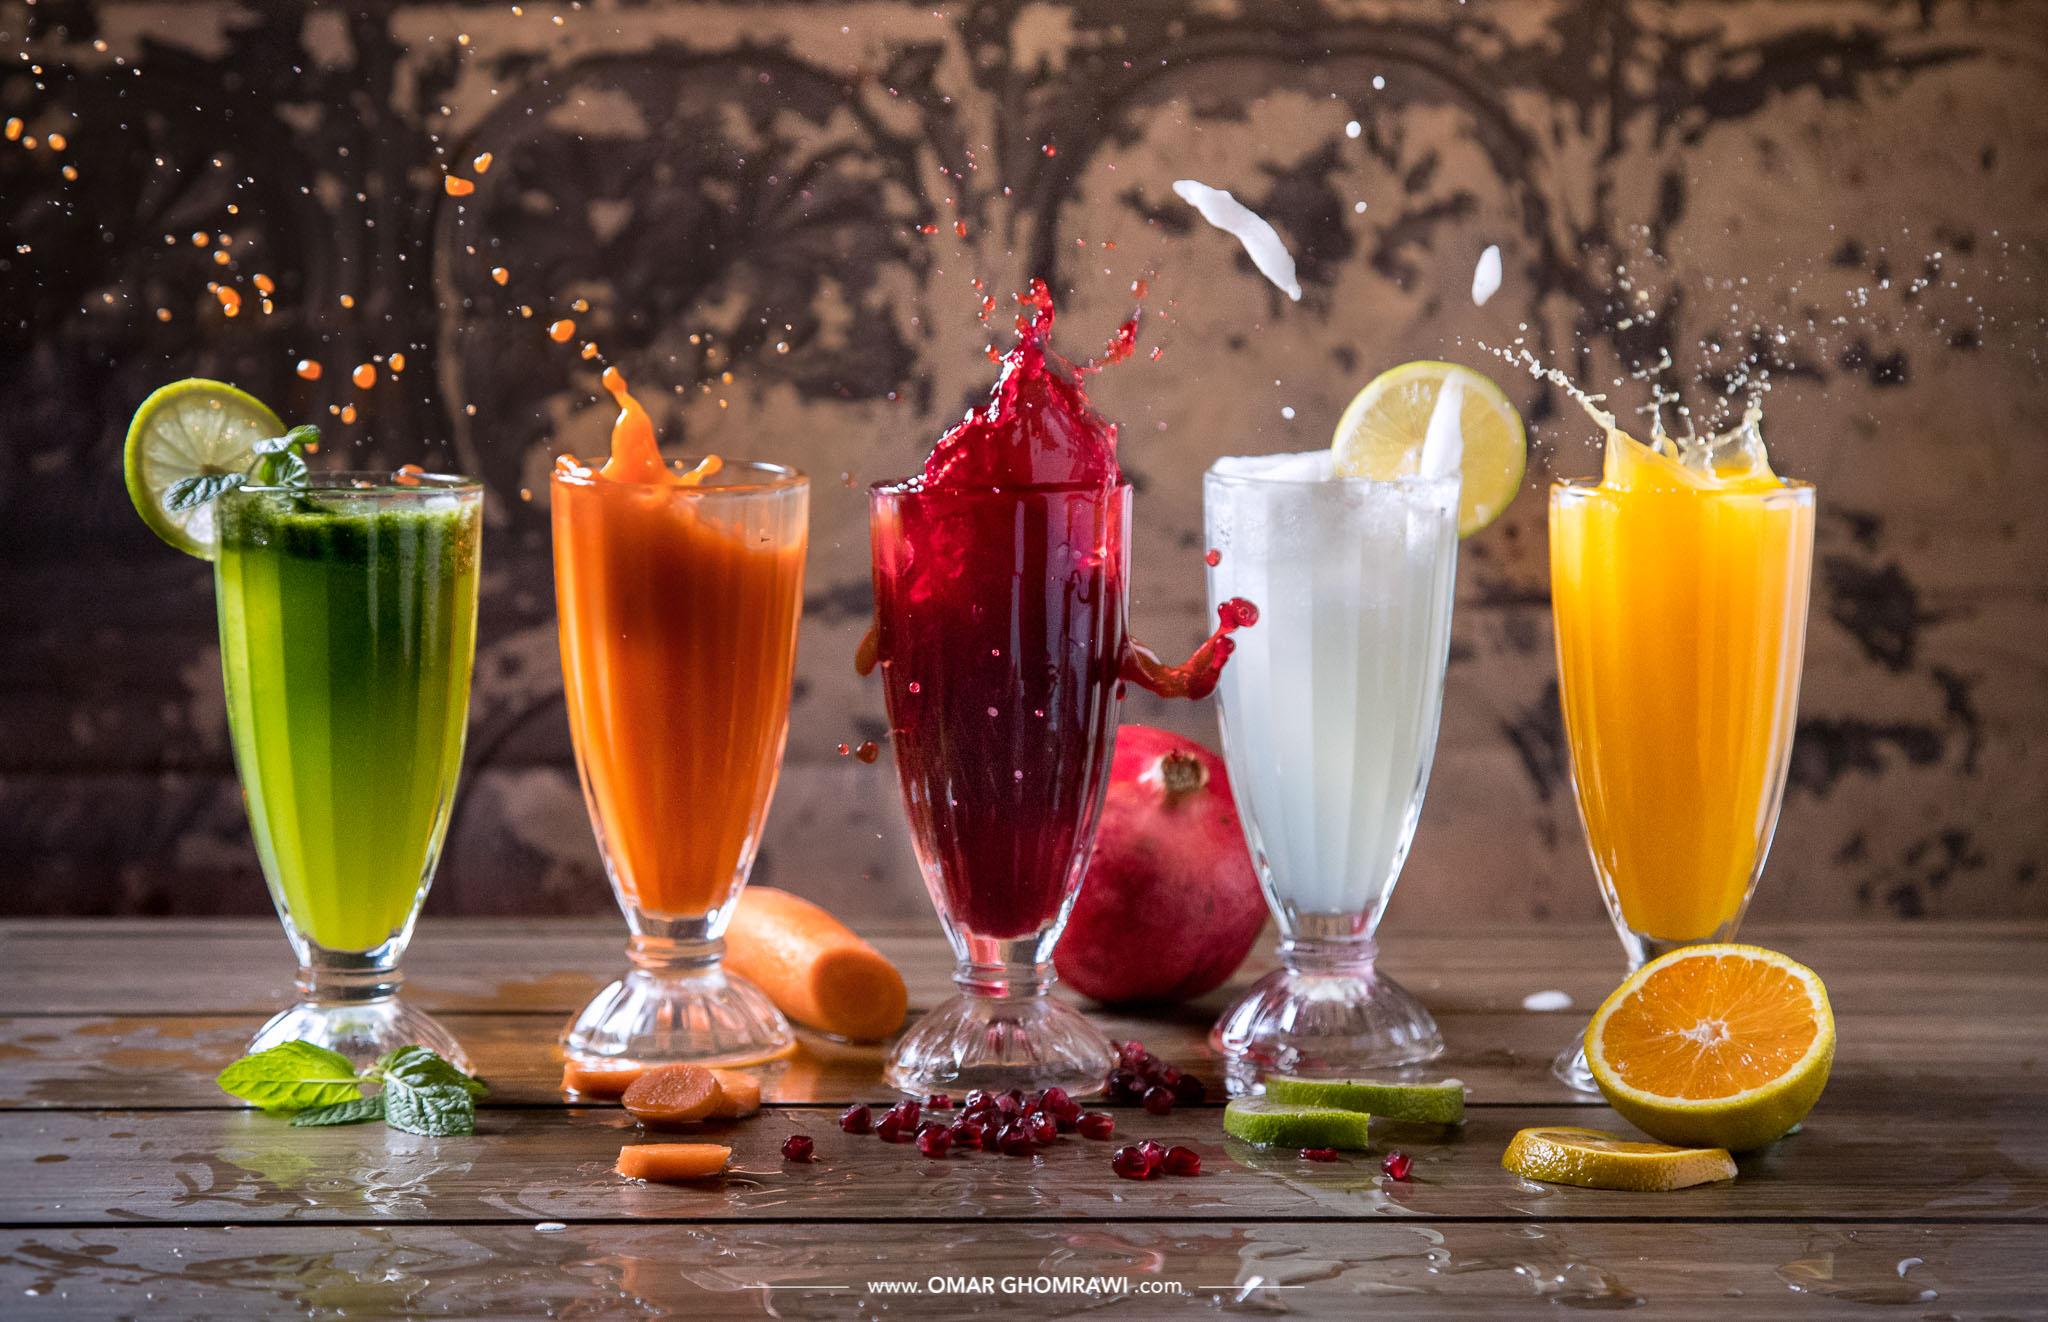 Juices 9274